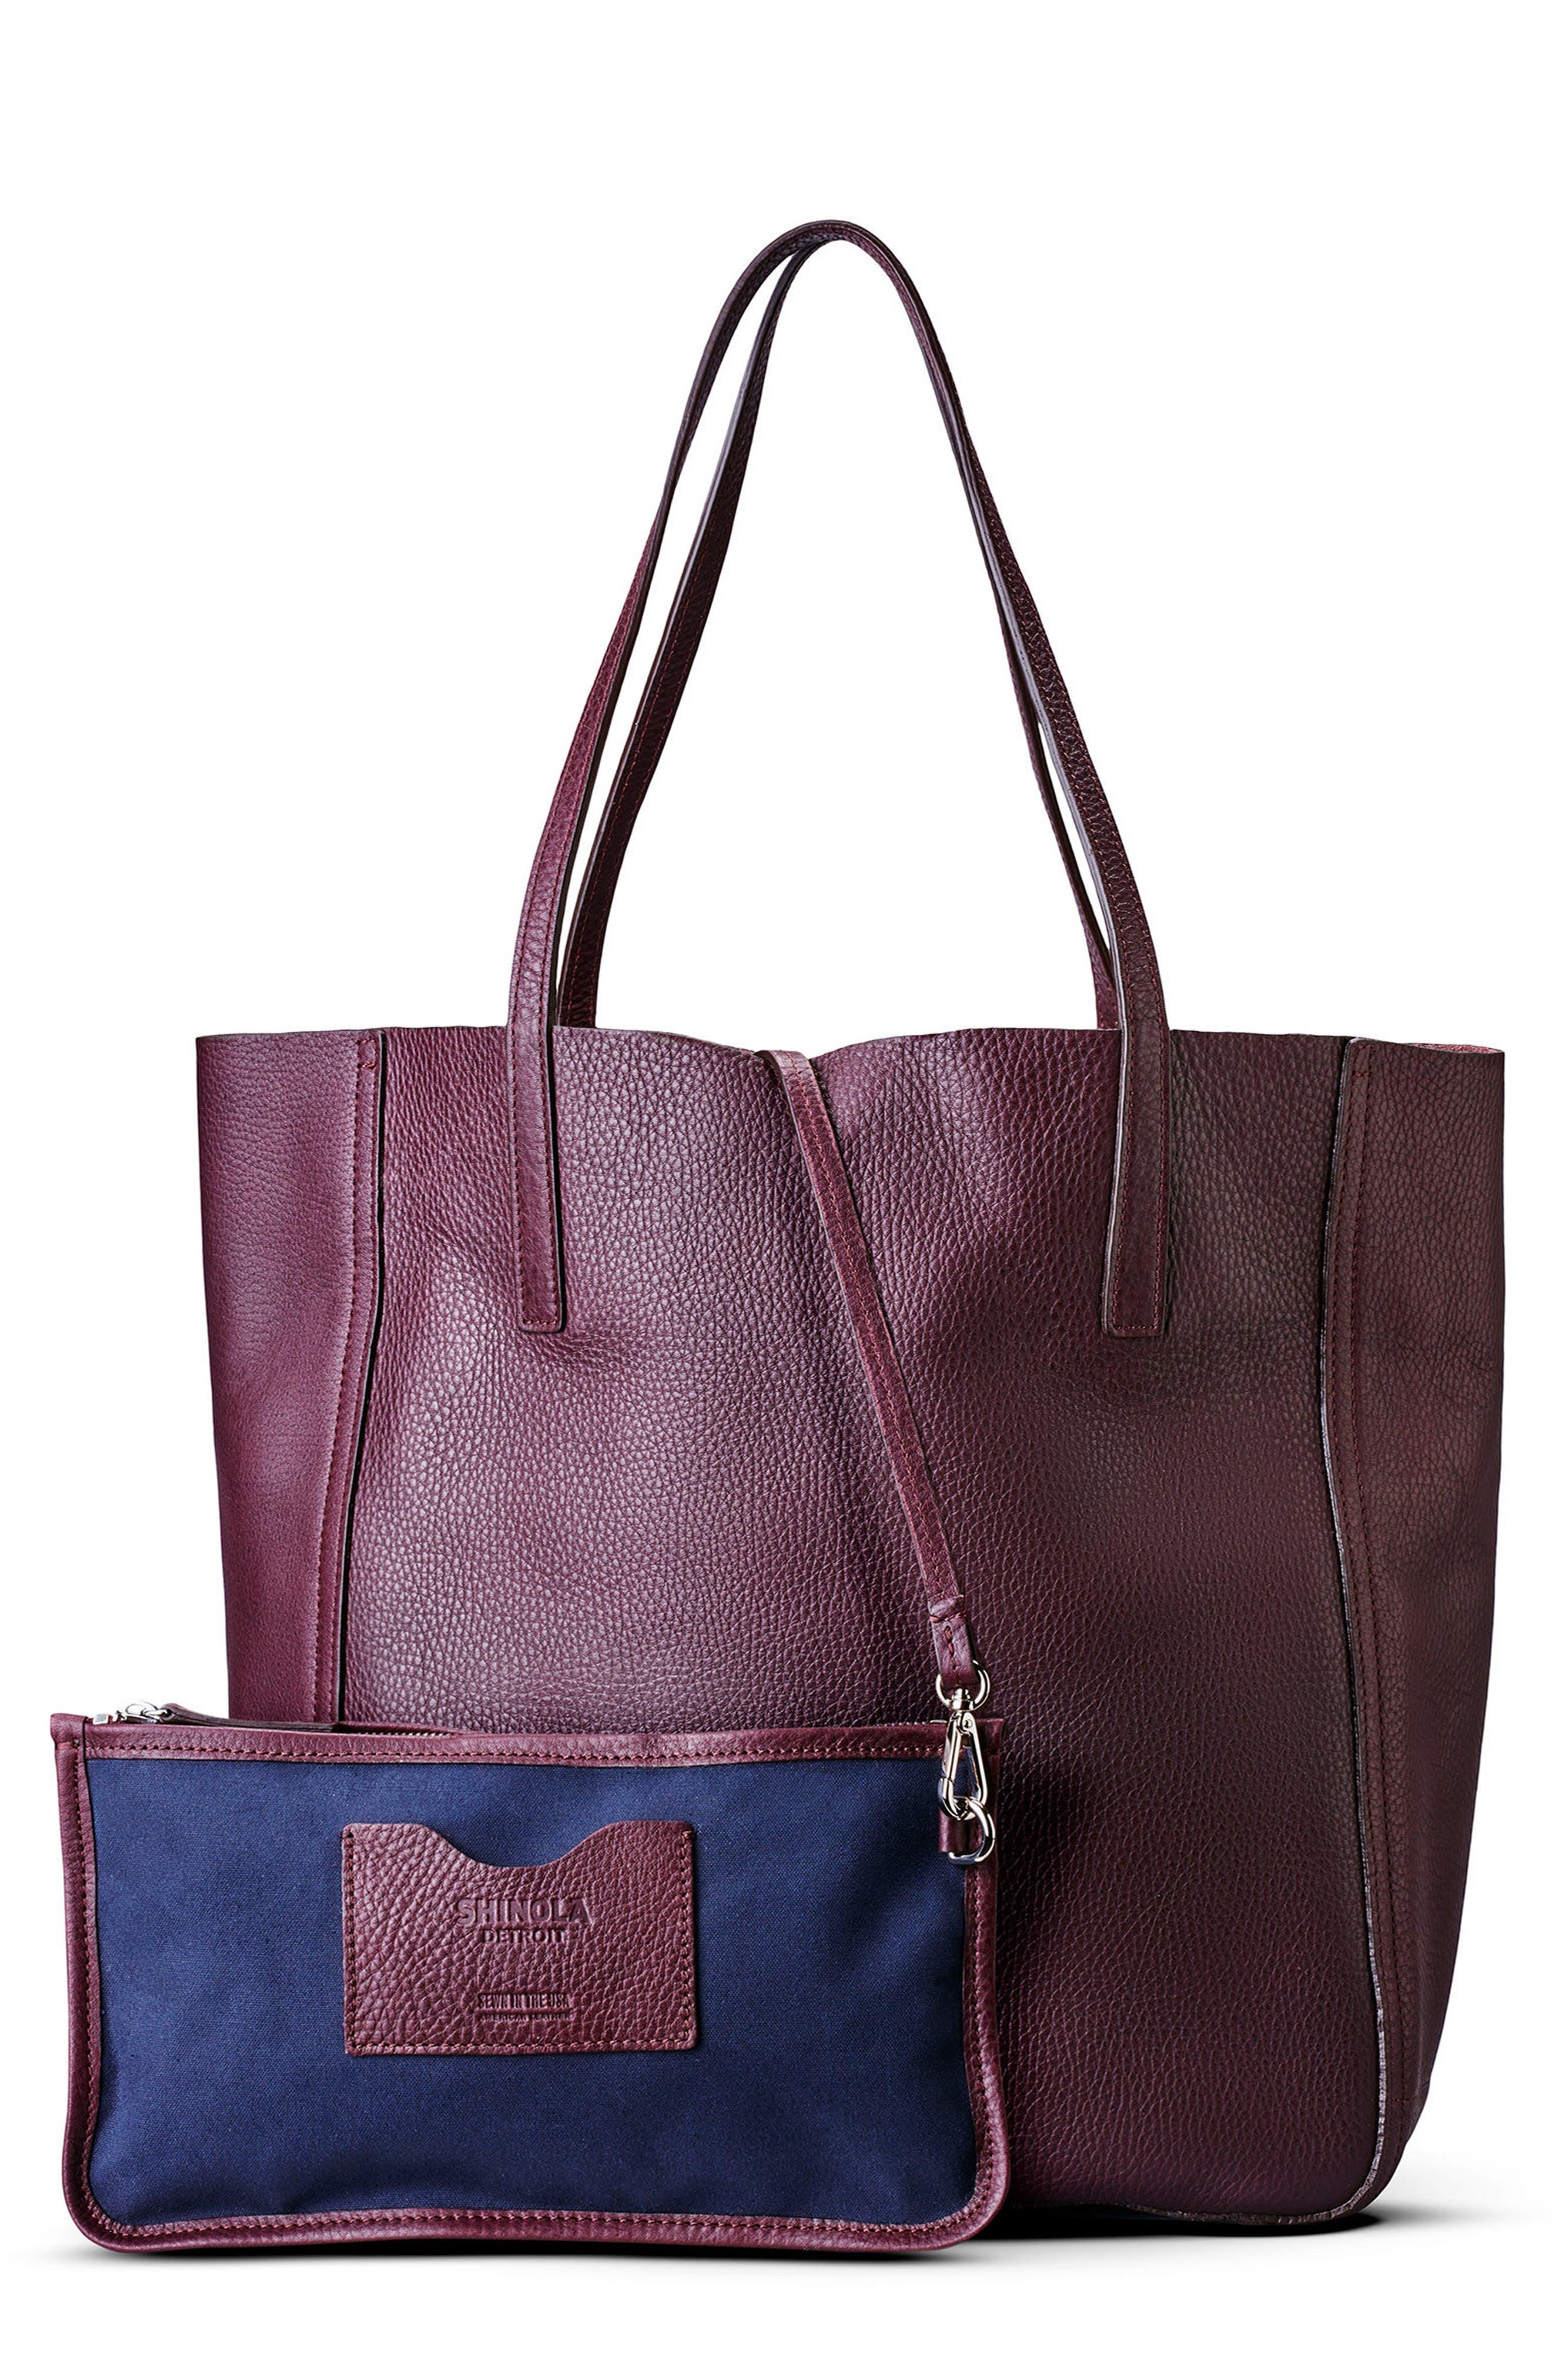 Alternate Image 1 Selected - Shinola Medium Leather Shopper (Nordstrom Exclusive)